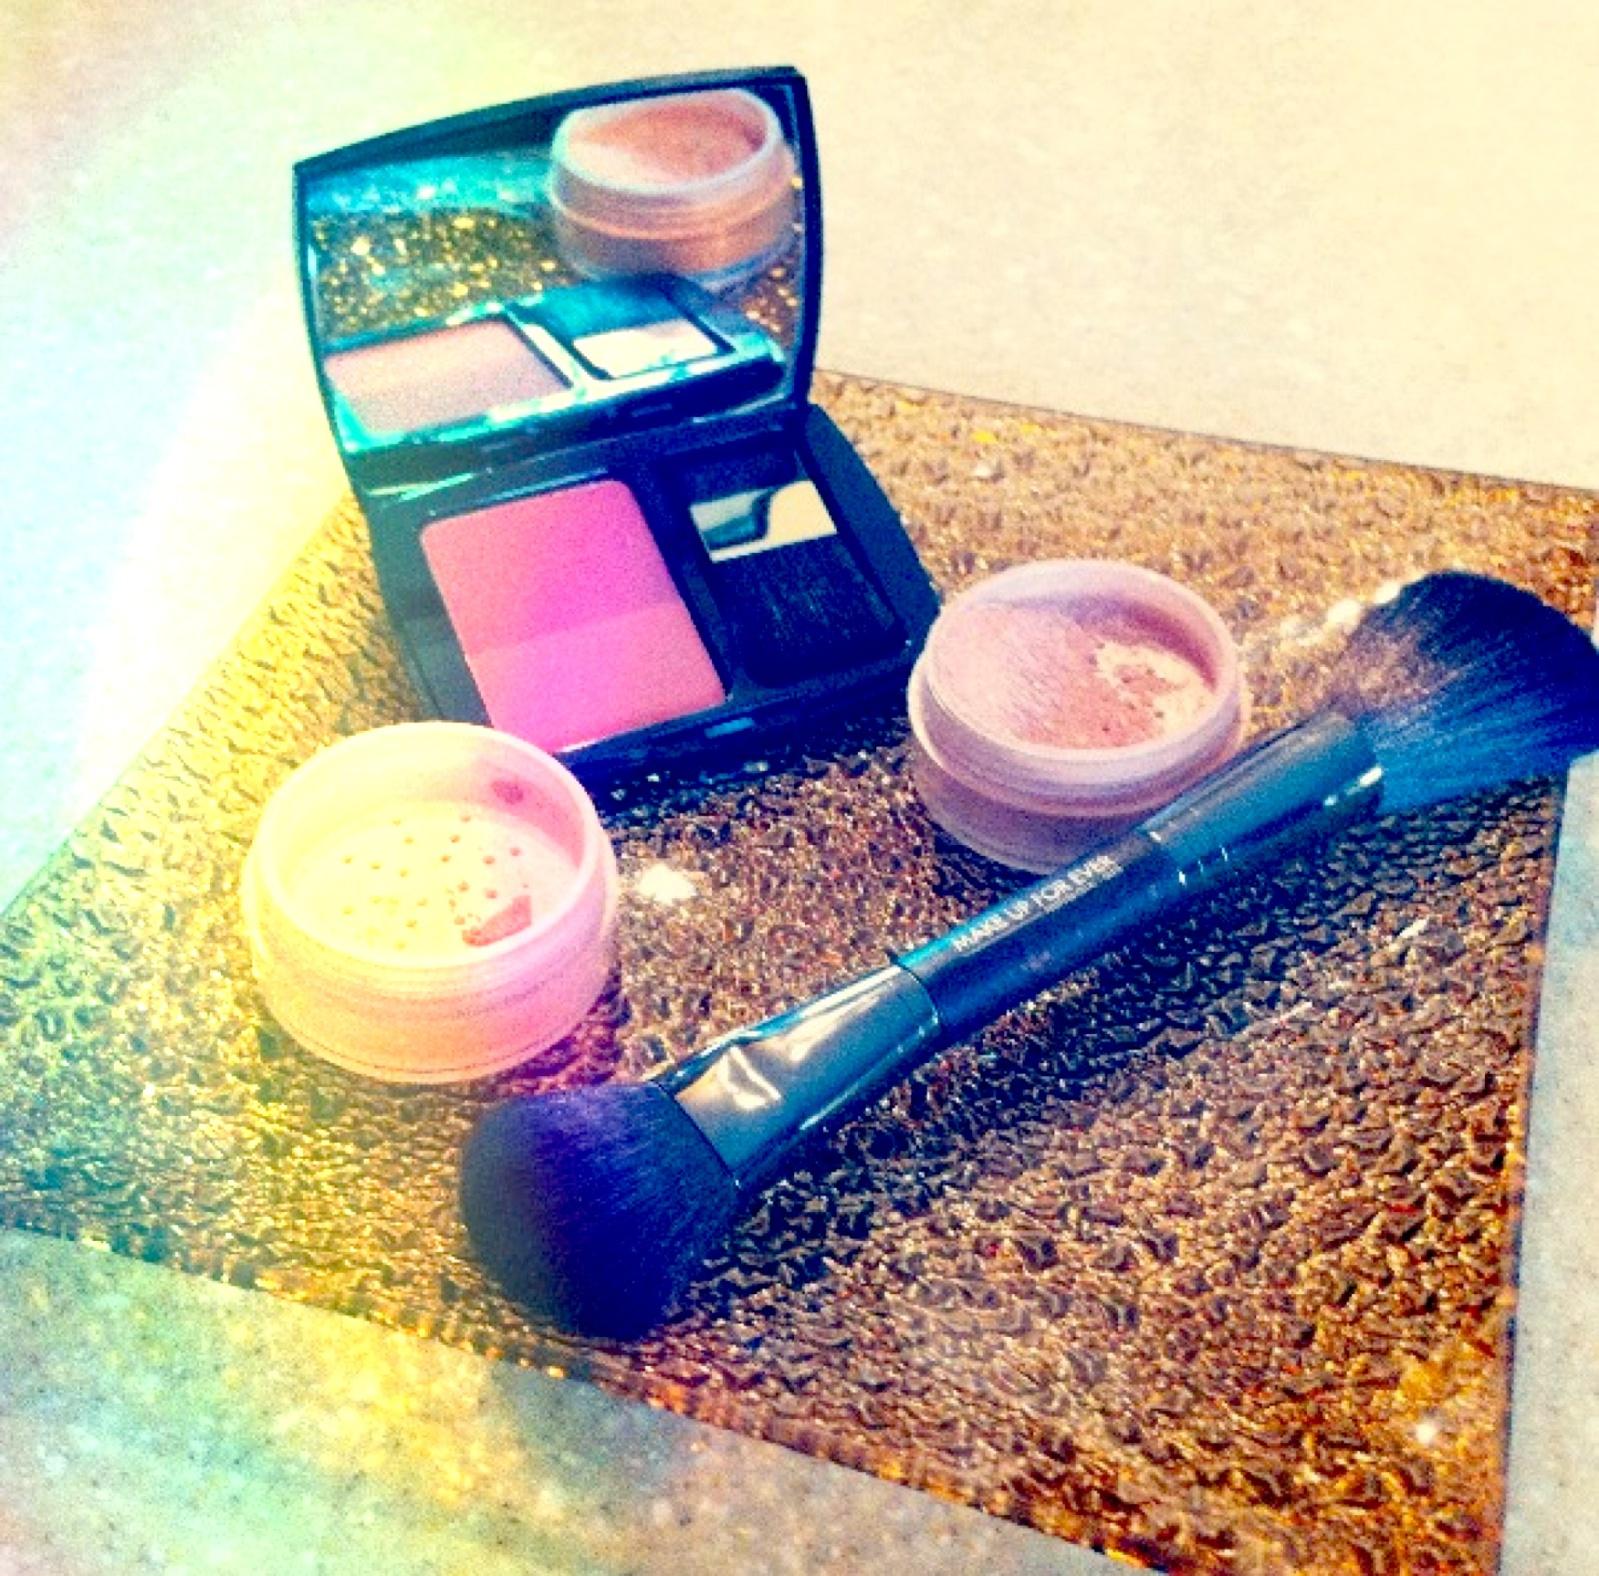 Blush, how to, makeup, pink, sculpt, rosey cheeks, bronzer, pretty